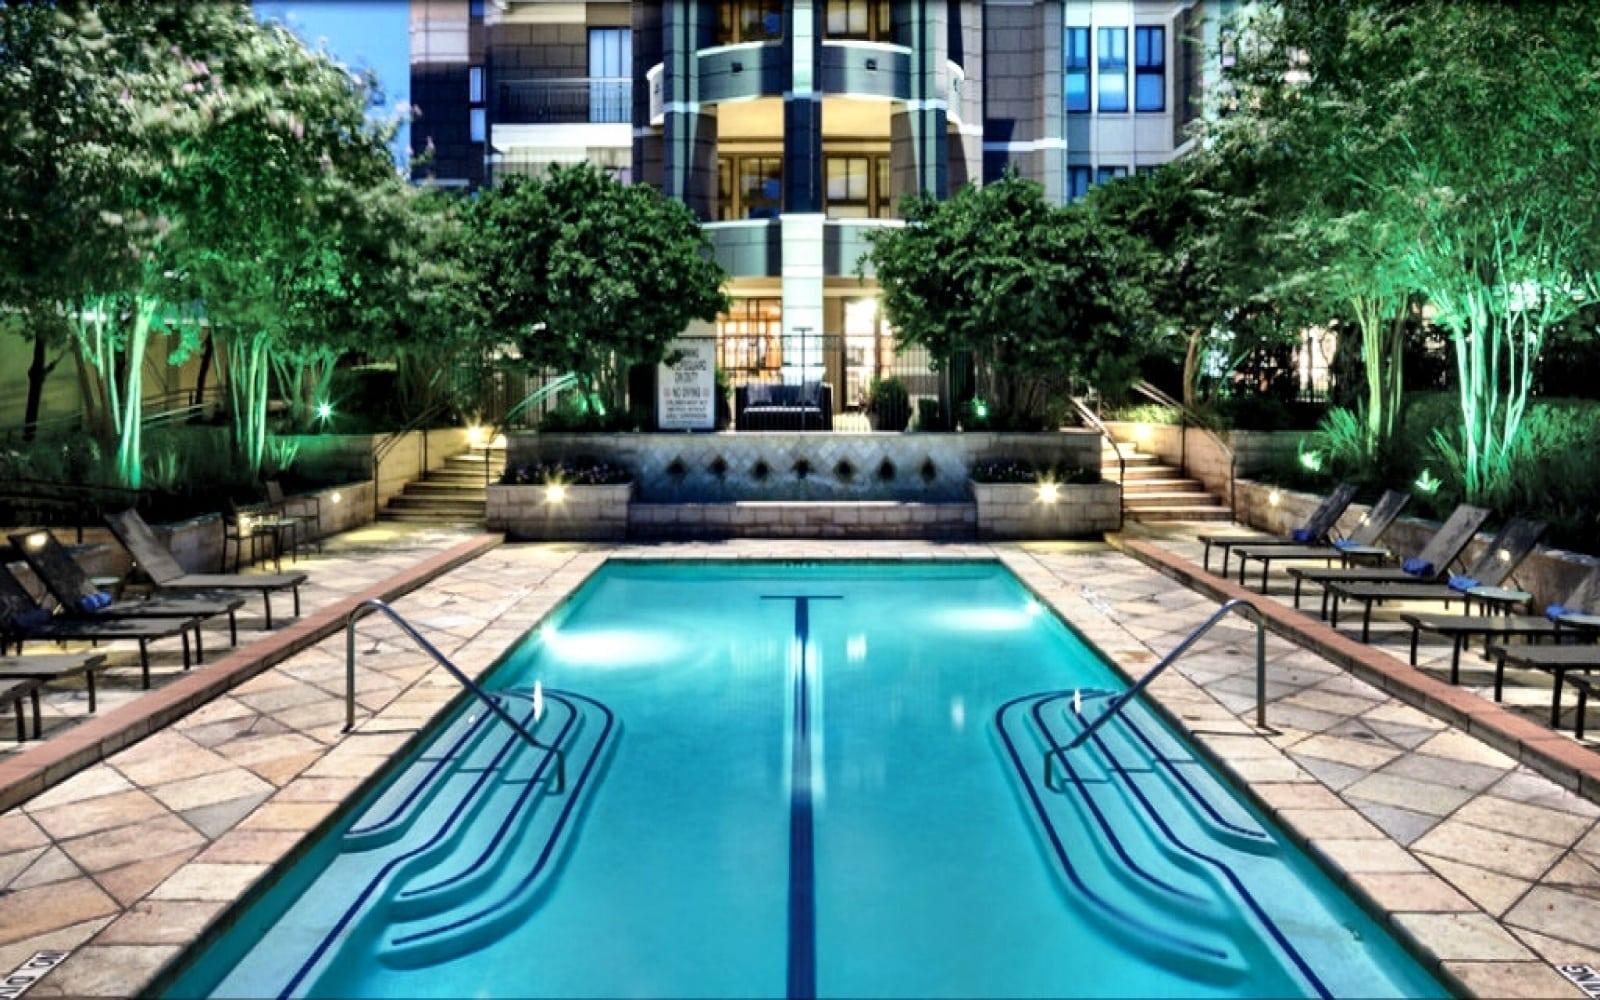 Texas,2 Bedrooms Bedrooms,2 BathroomsBathrooms,Apartment,8,2083